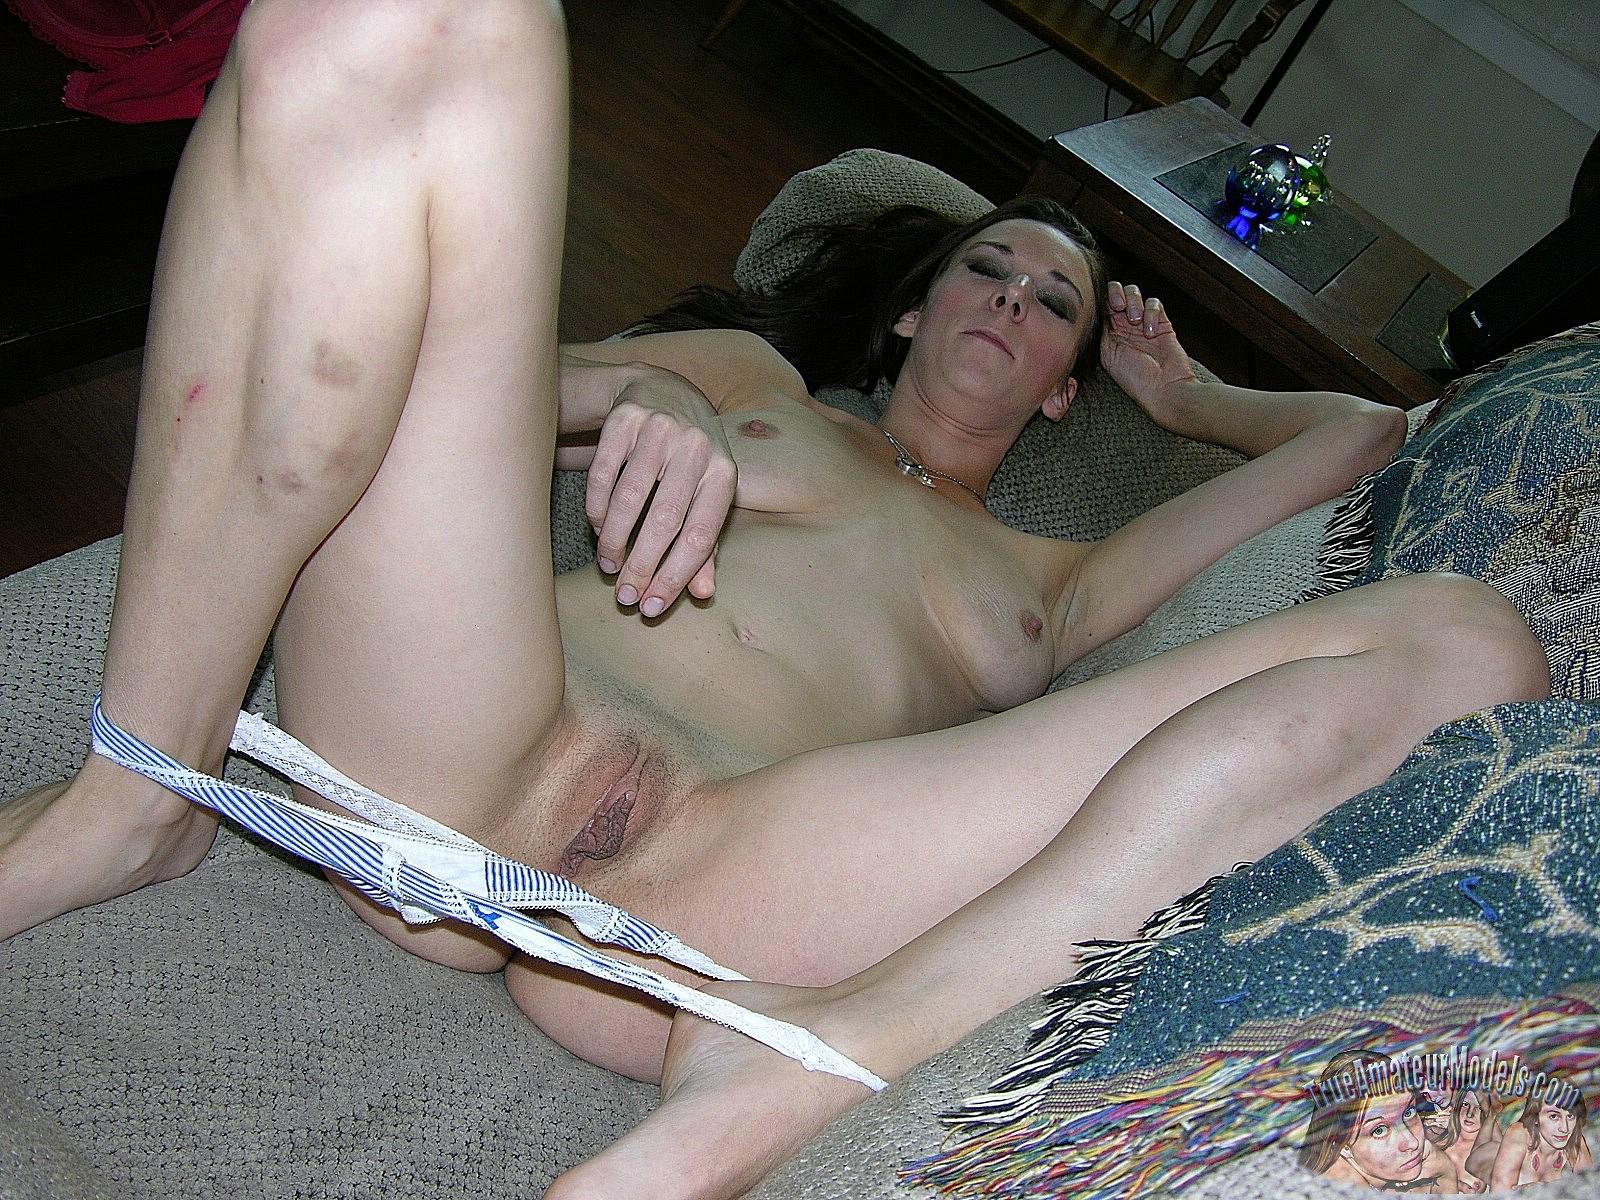 Scarlett johansson naked fakes nudes